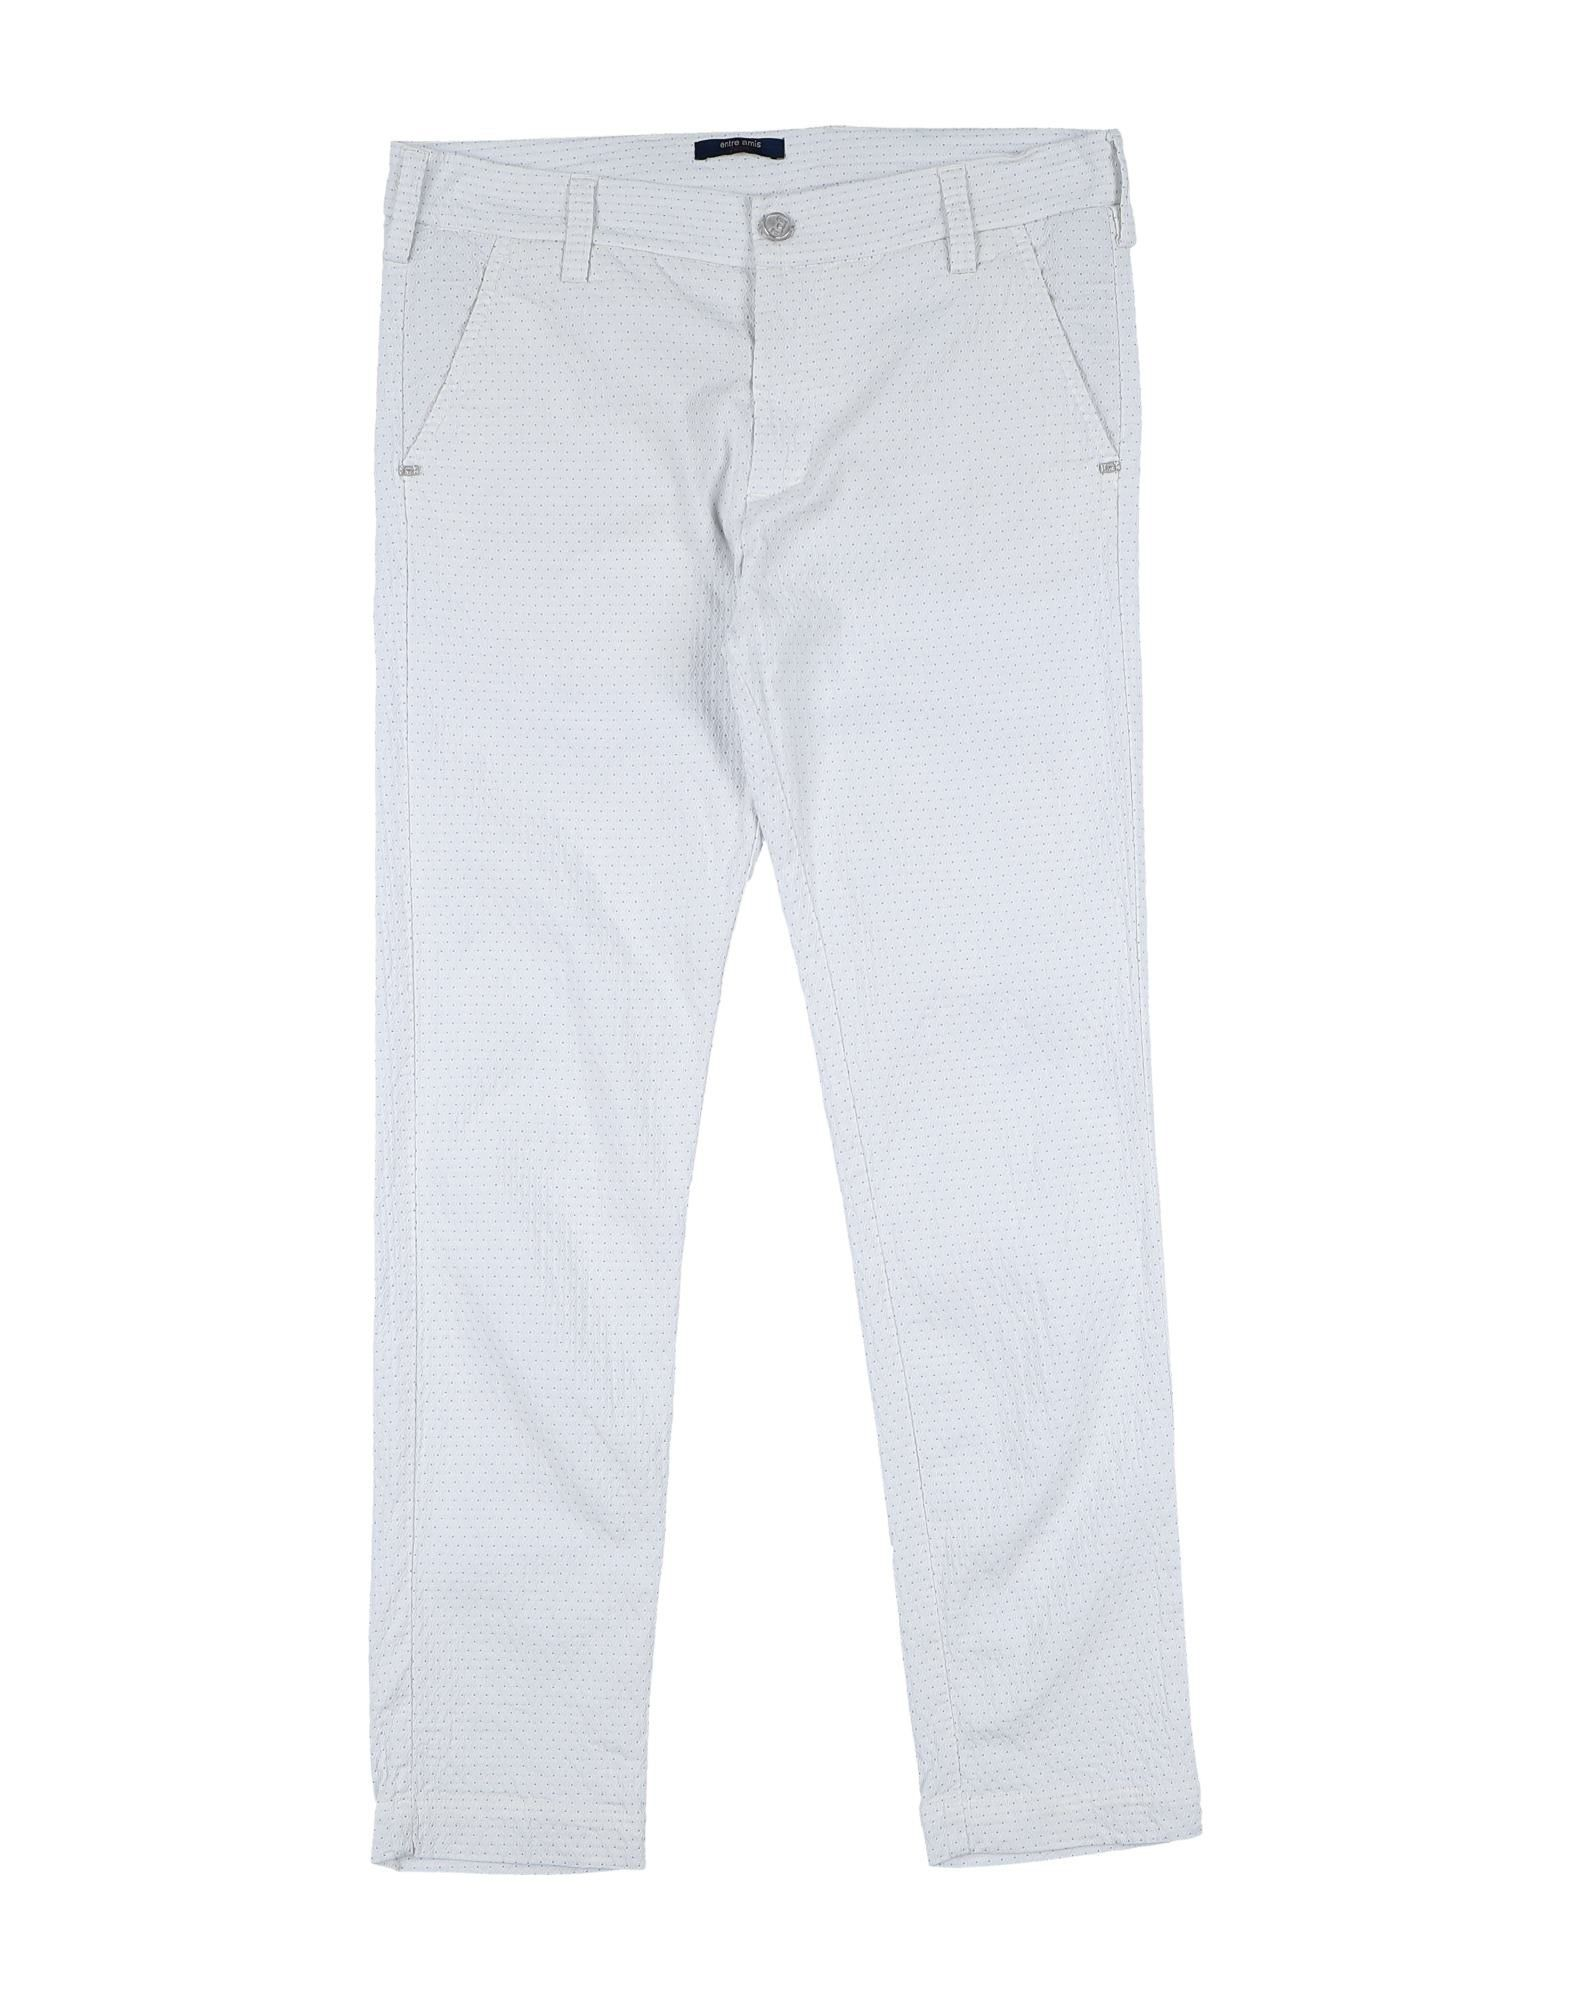 Entre Amis Garçon Kids' Casual Pants In White